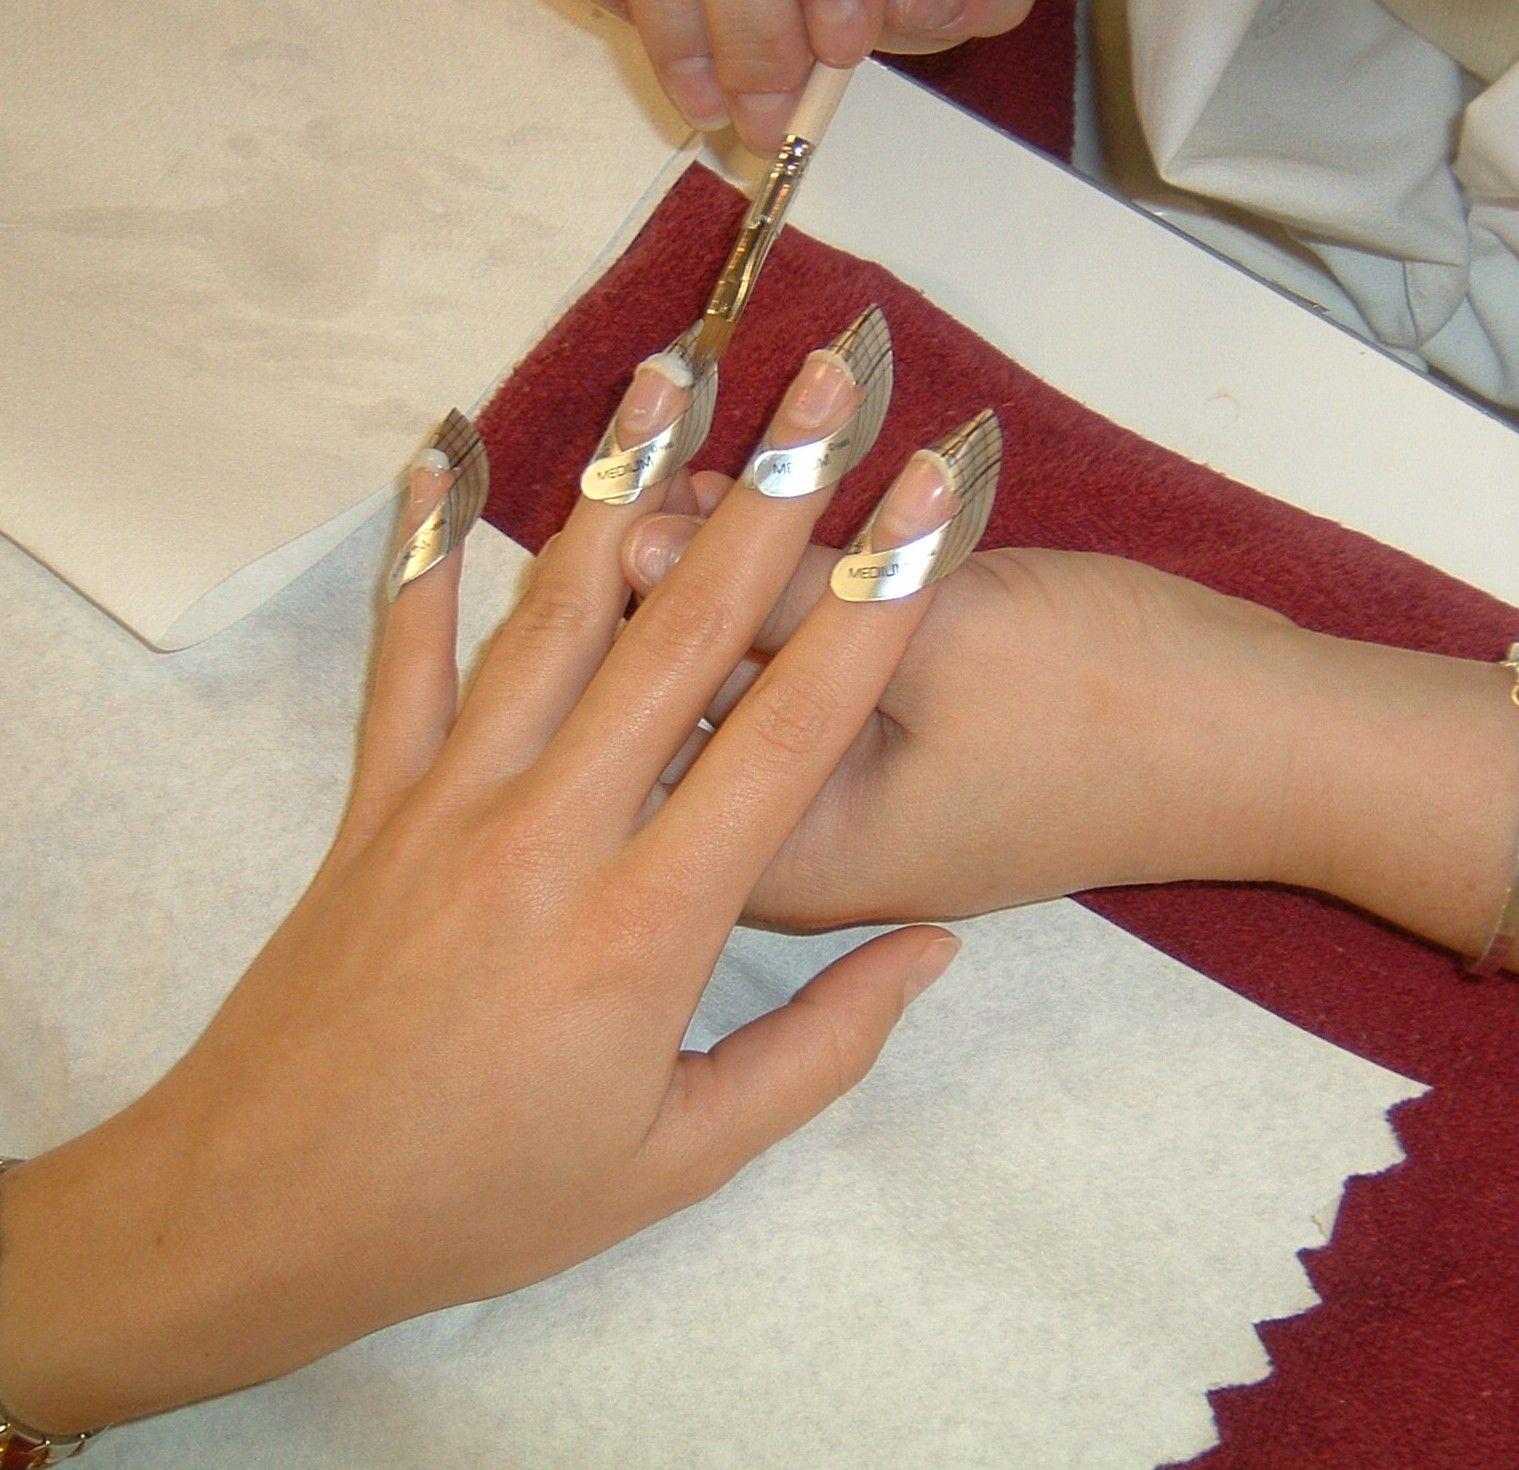 Fiberglass Nail Wraps sculptured | Cosmo school | Pinterest